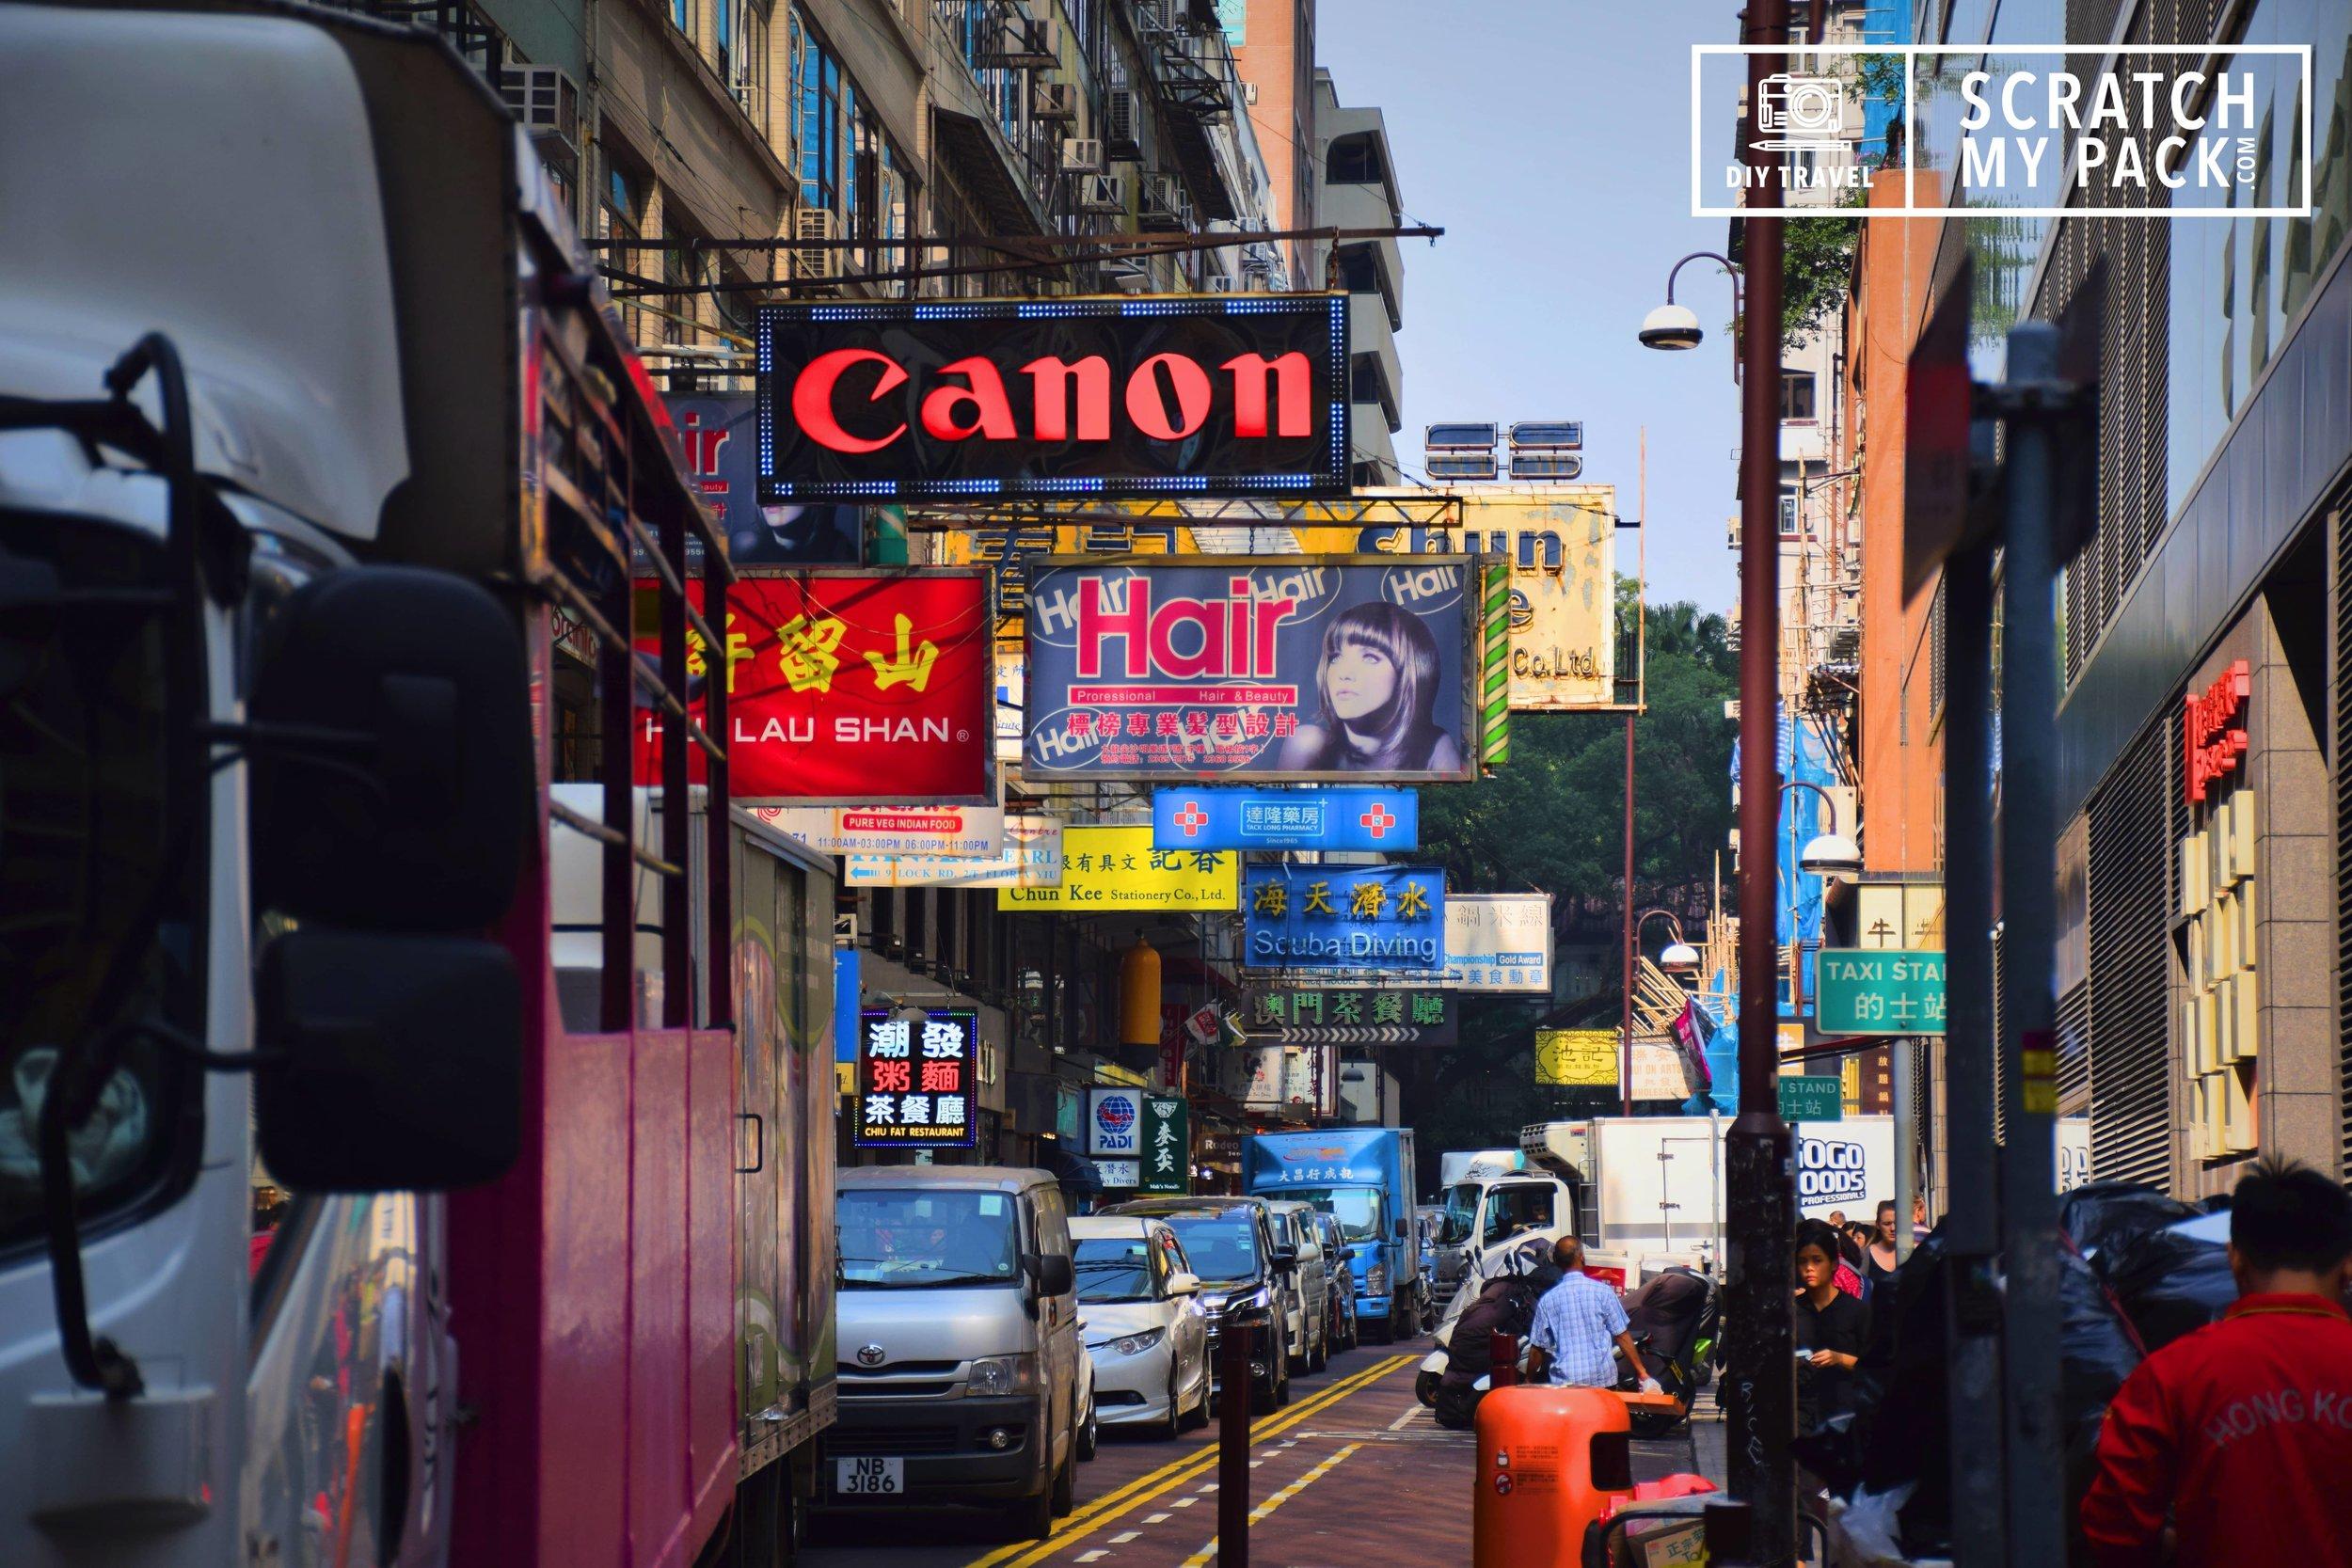 Near Chungking Mansions